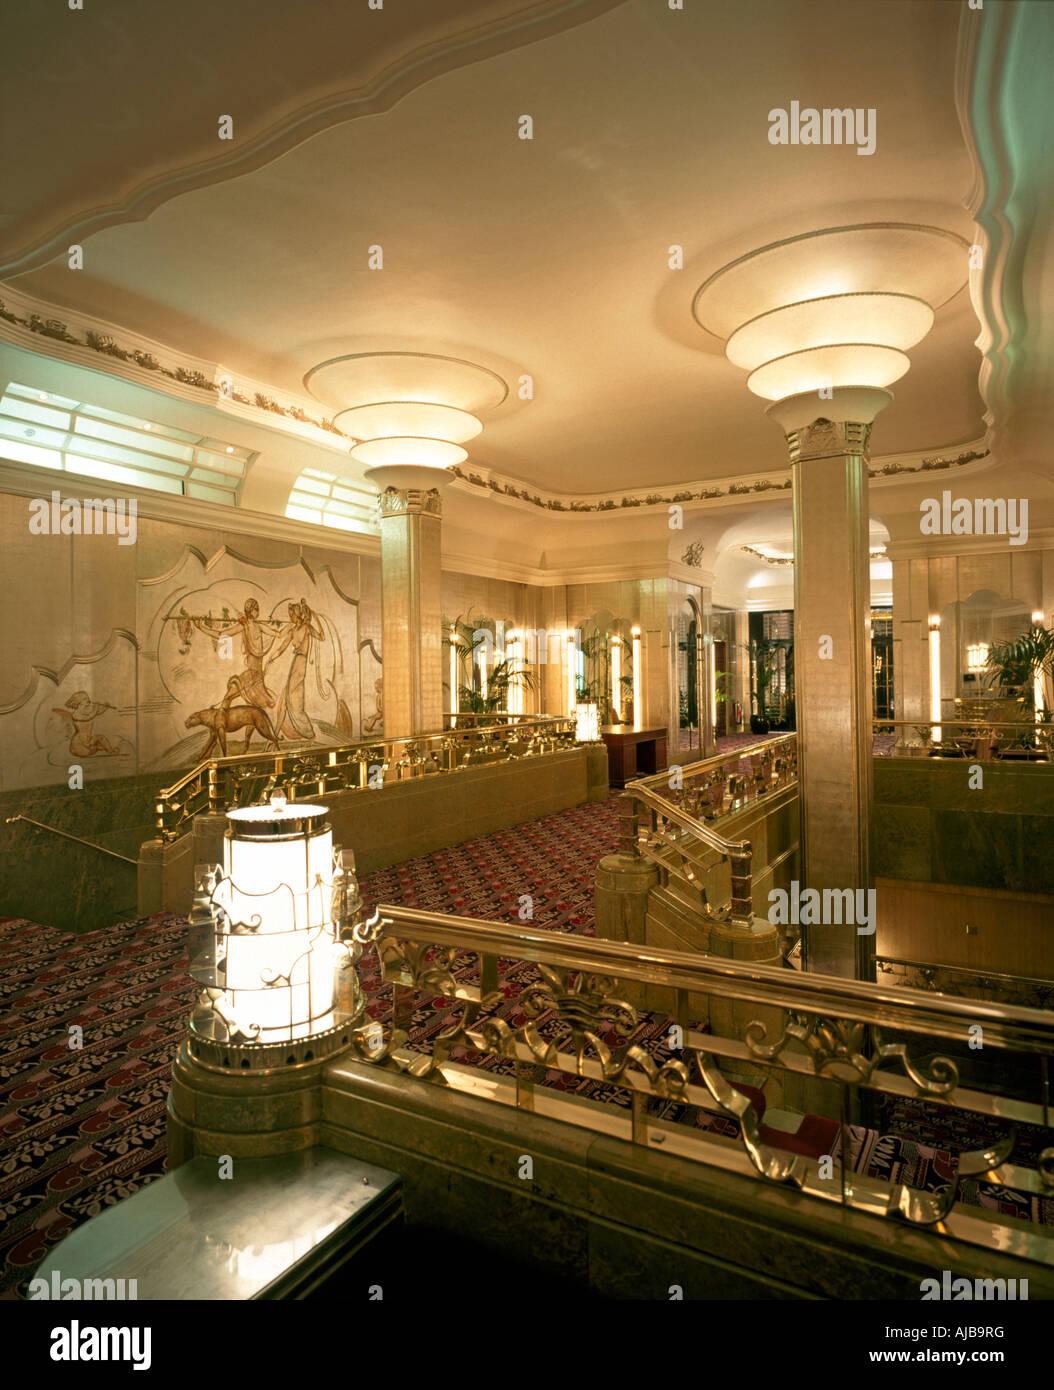 Foyer-Interieur im Art Deco Stil der Hyde Park Hotel London W1 ...